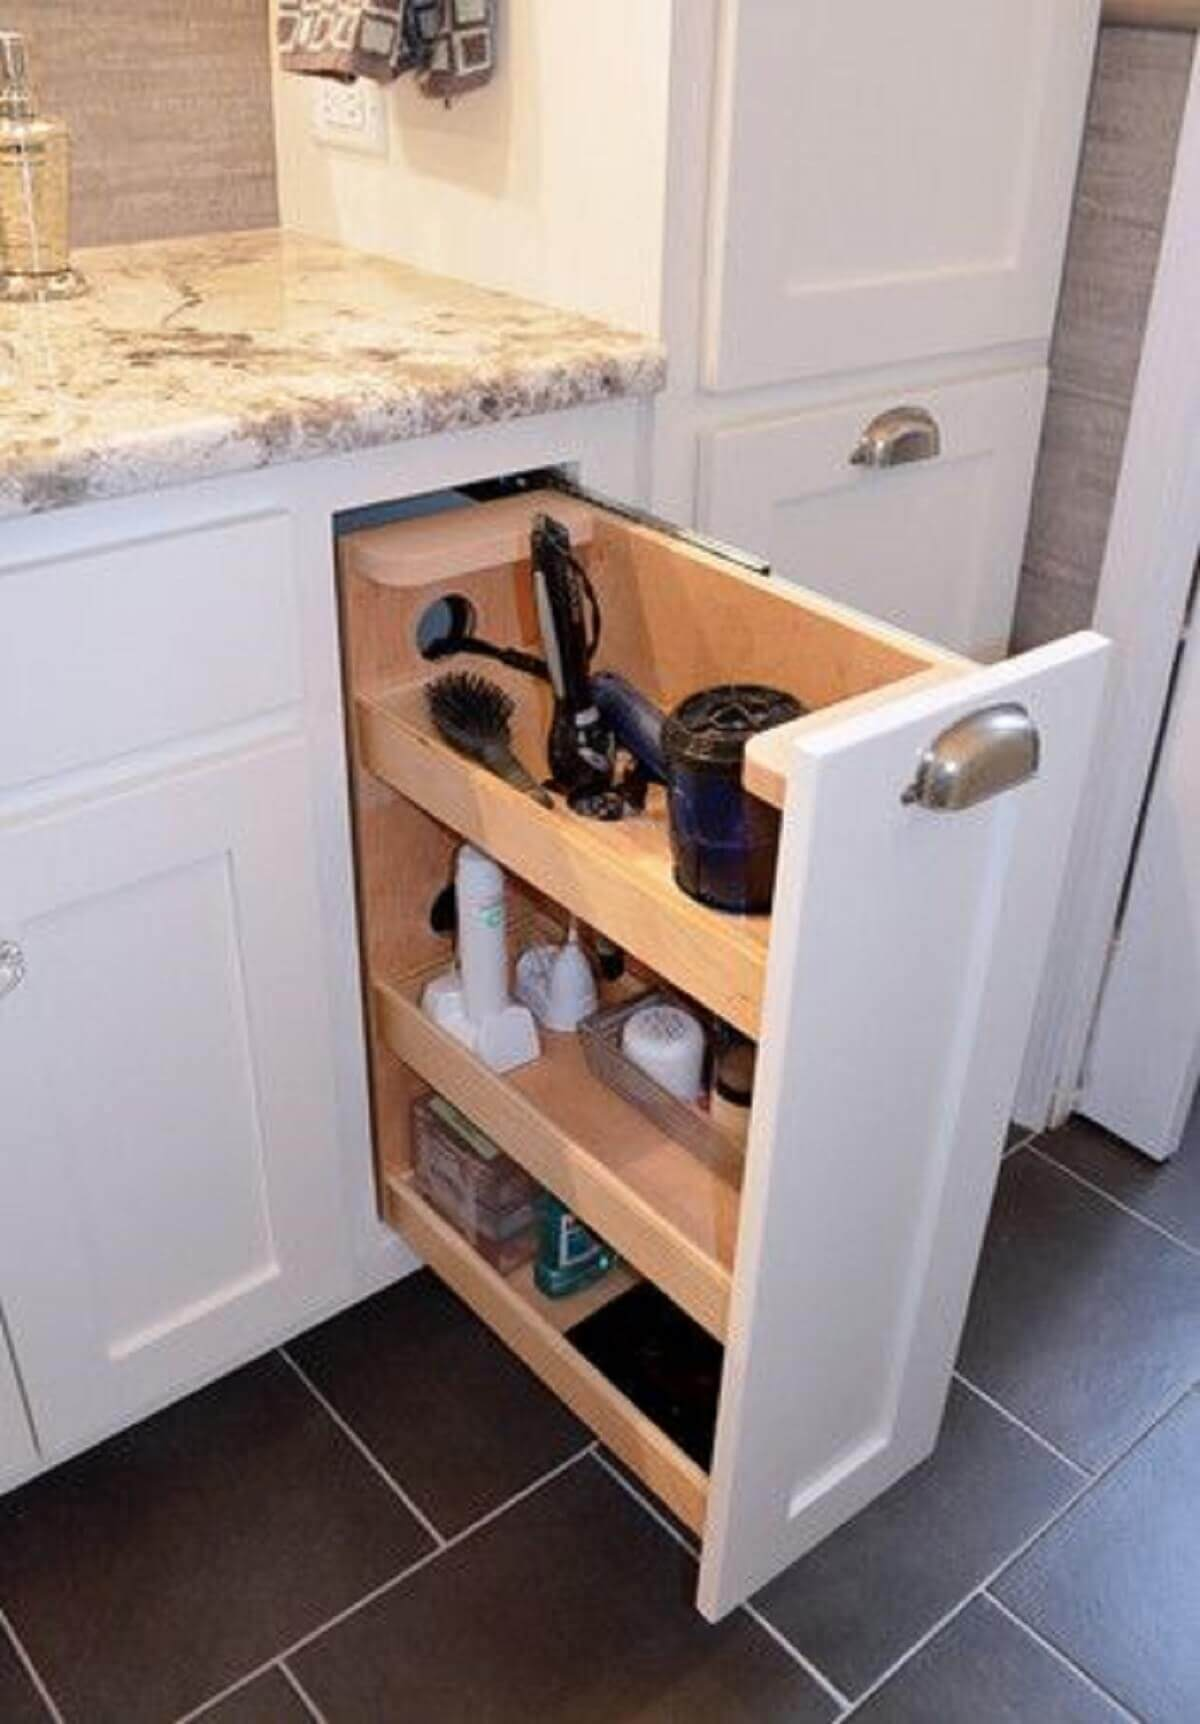 Bathroom Storage Ideas Storage for Hair Dryer - Harptimes.com